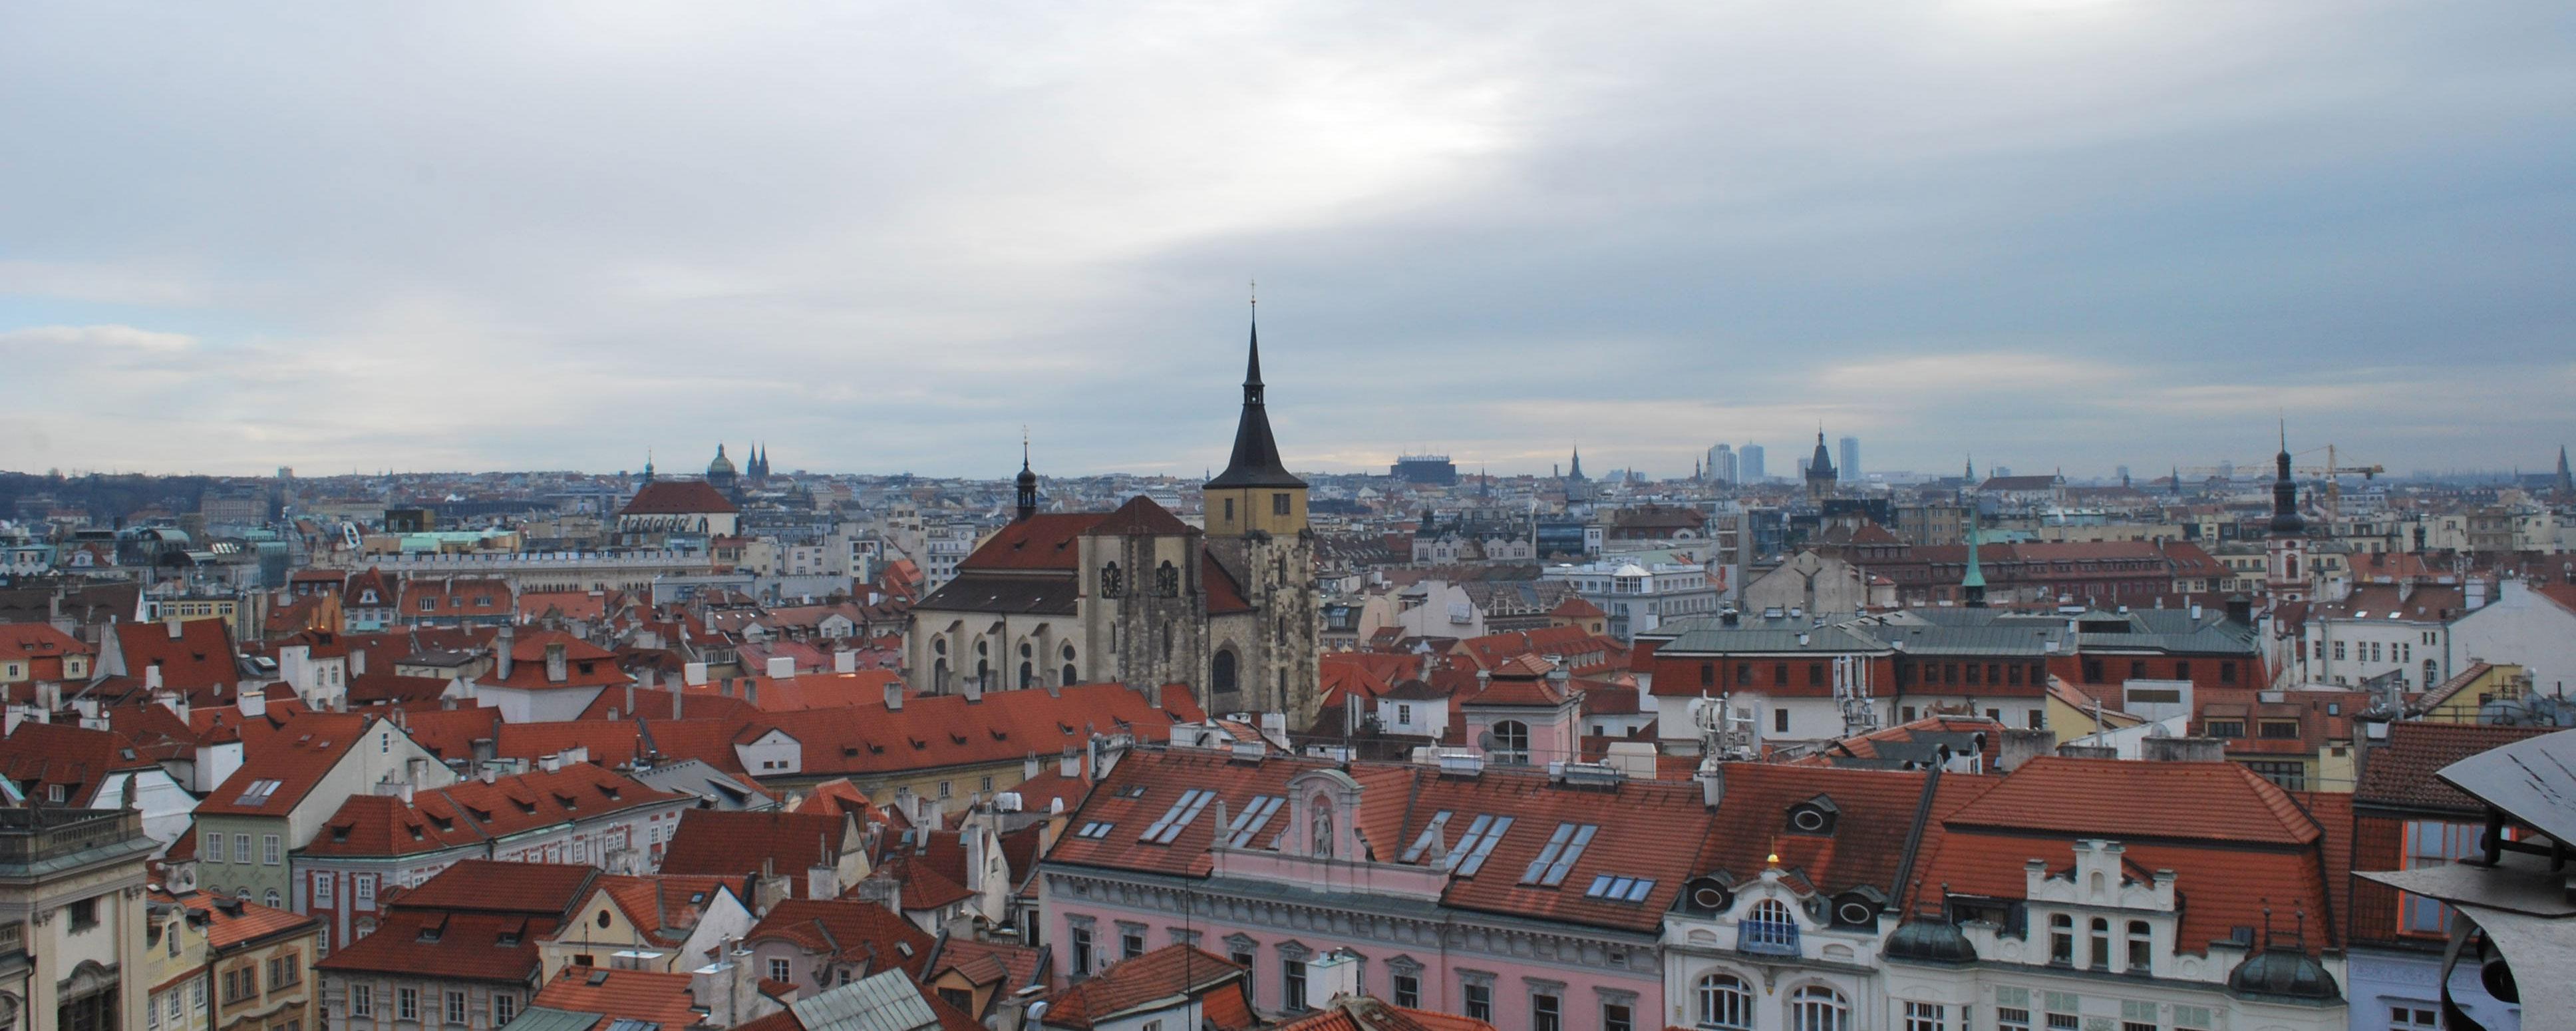 Visitare Praga in un weekend